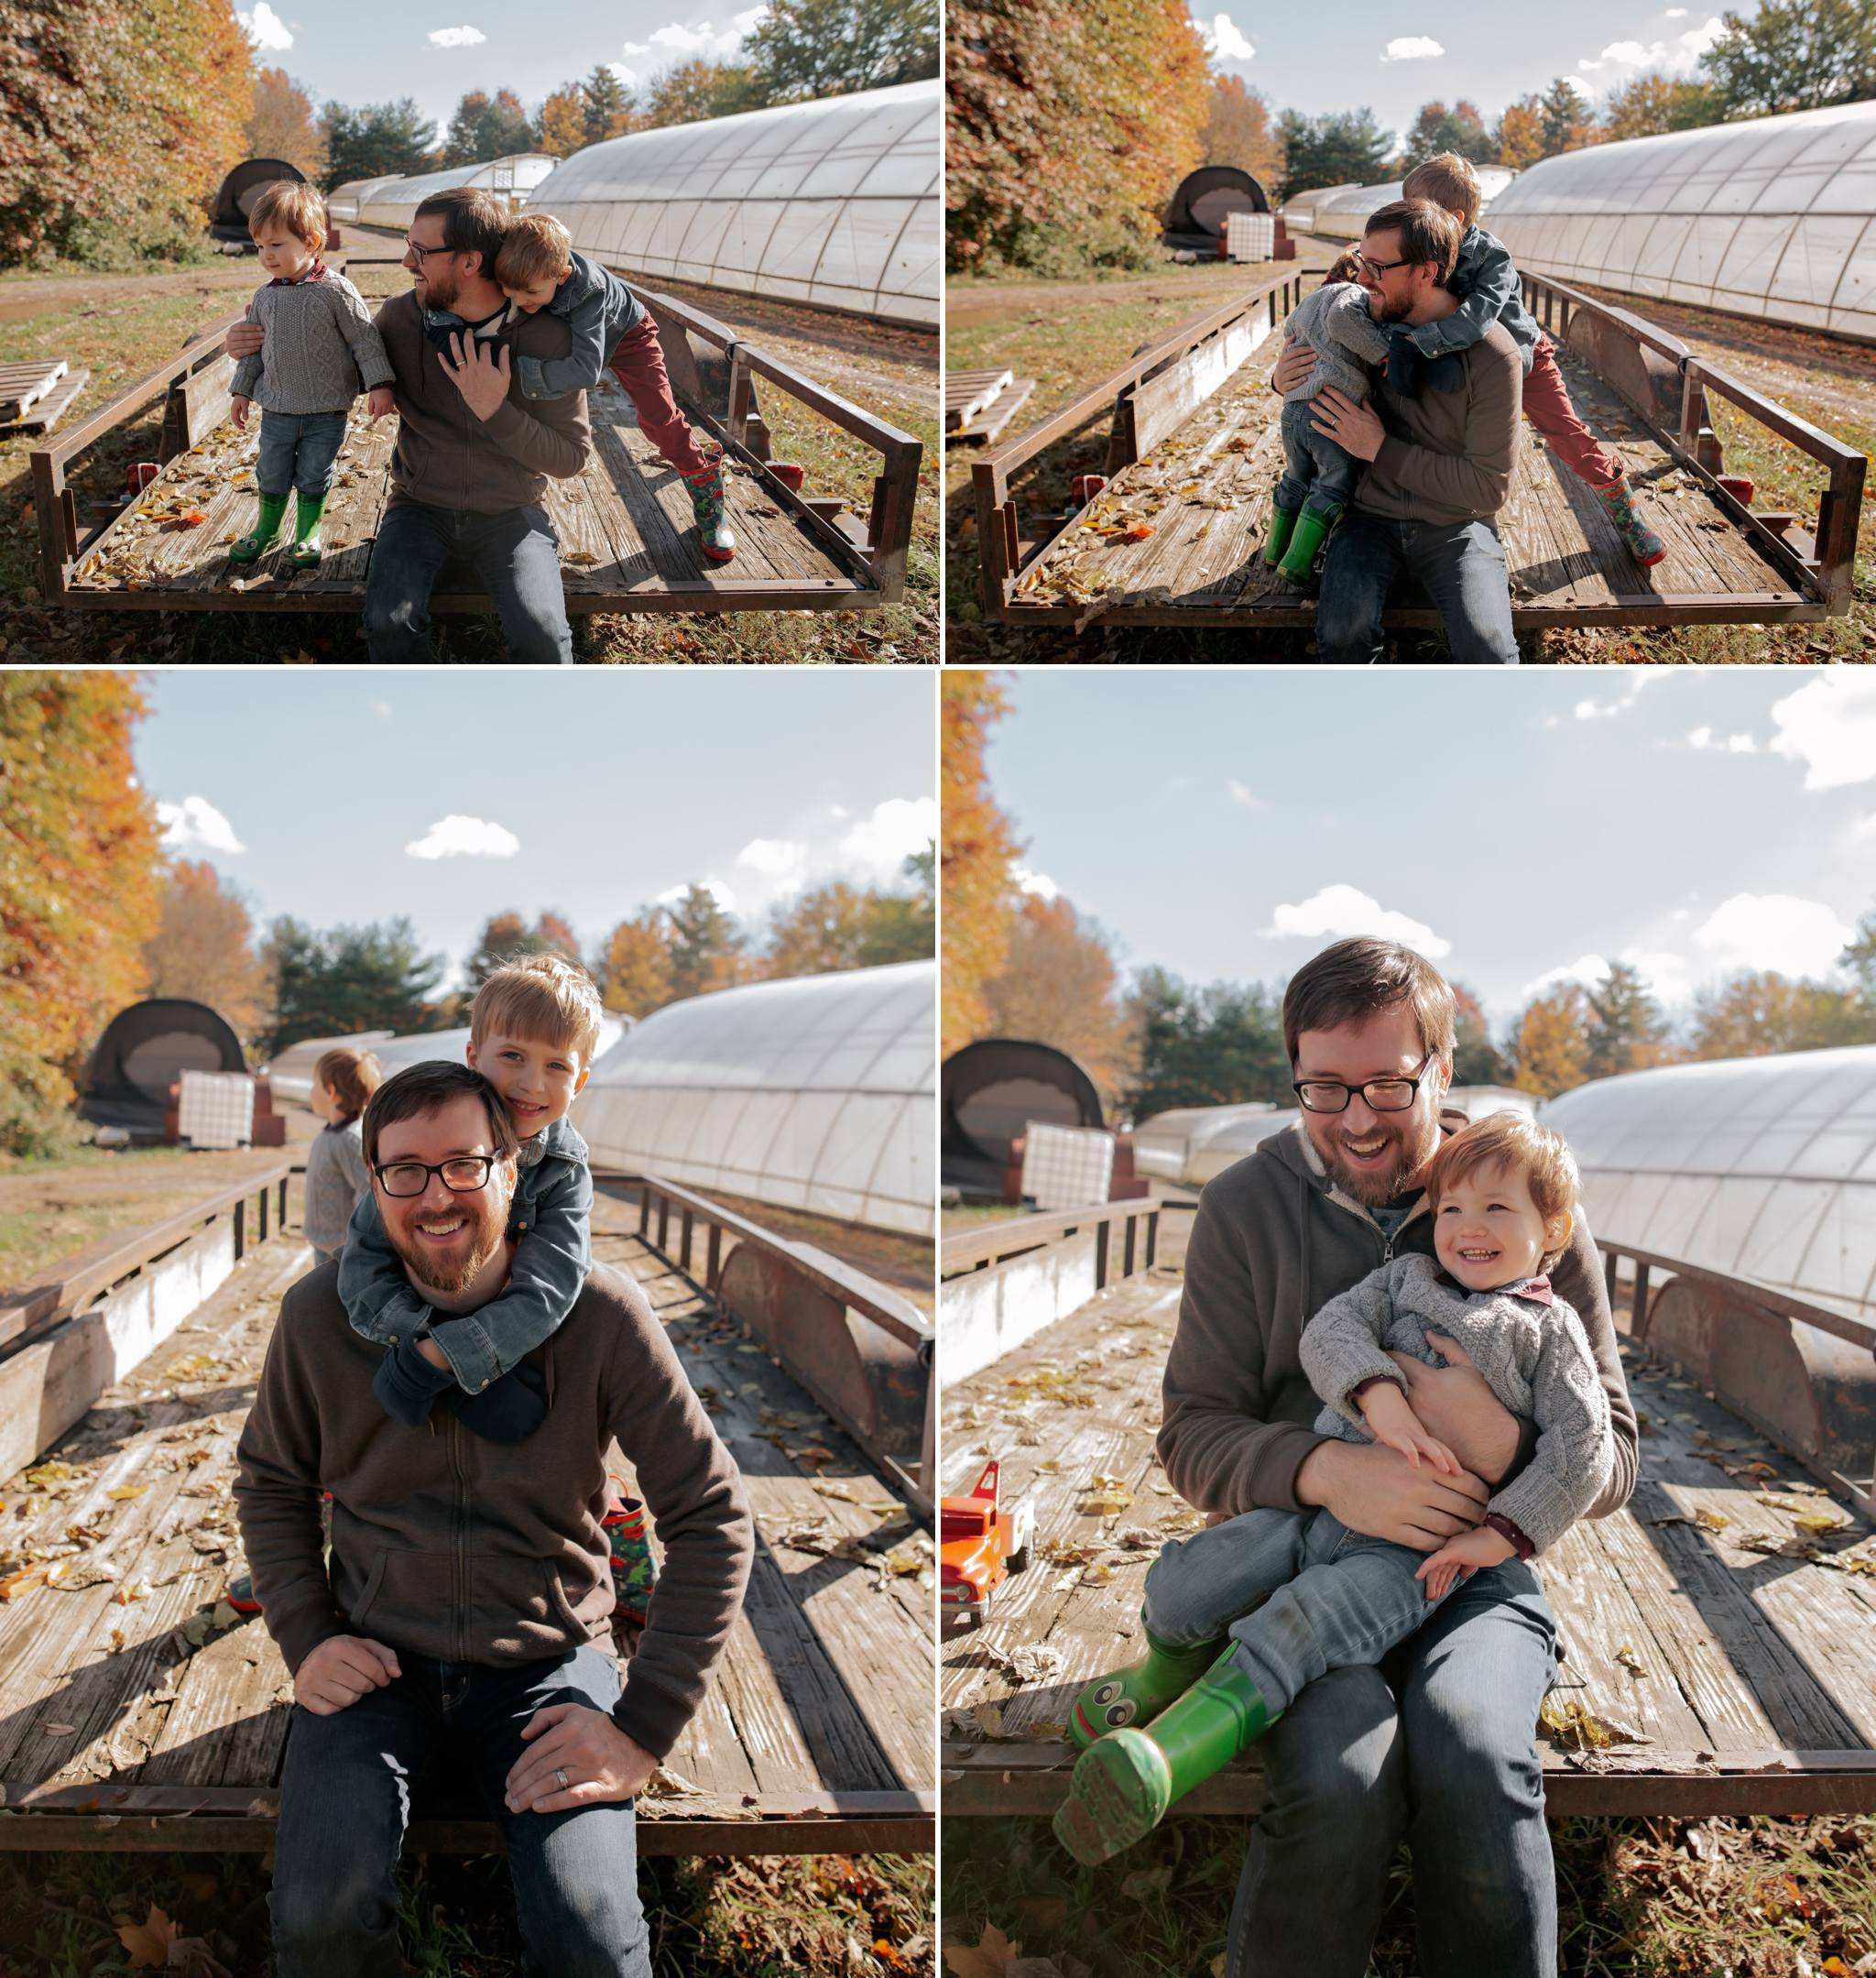 columbus-ohio-family-lifestyle-farm-photography-3.jpg